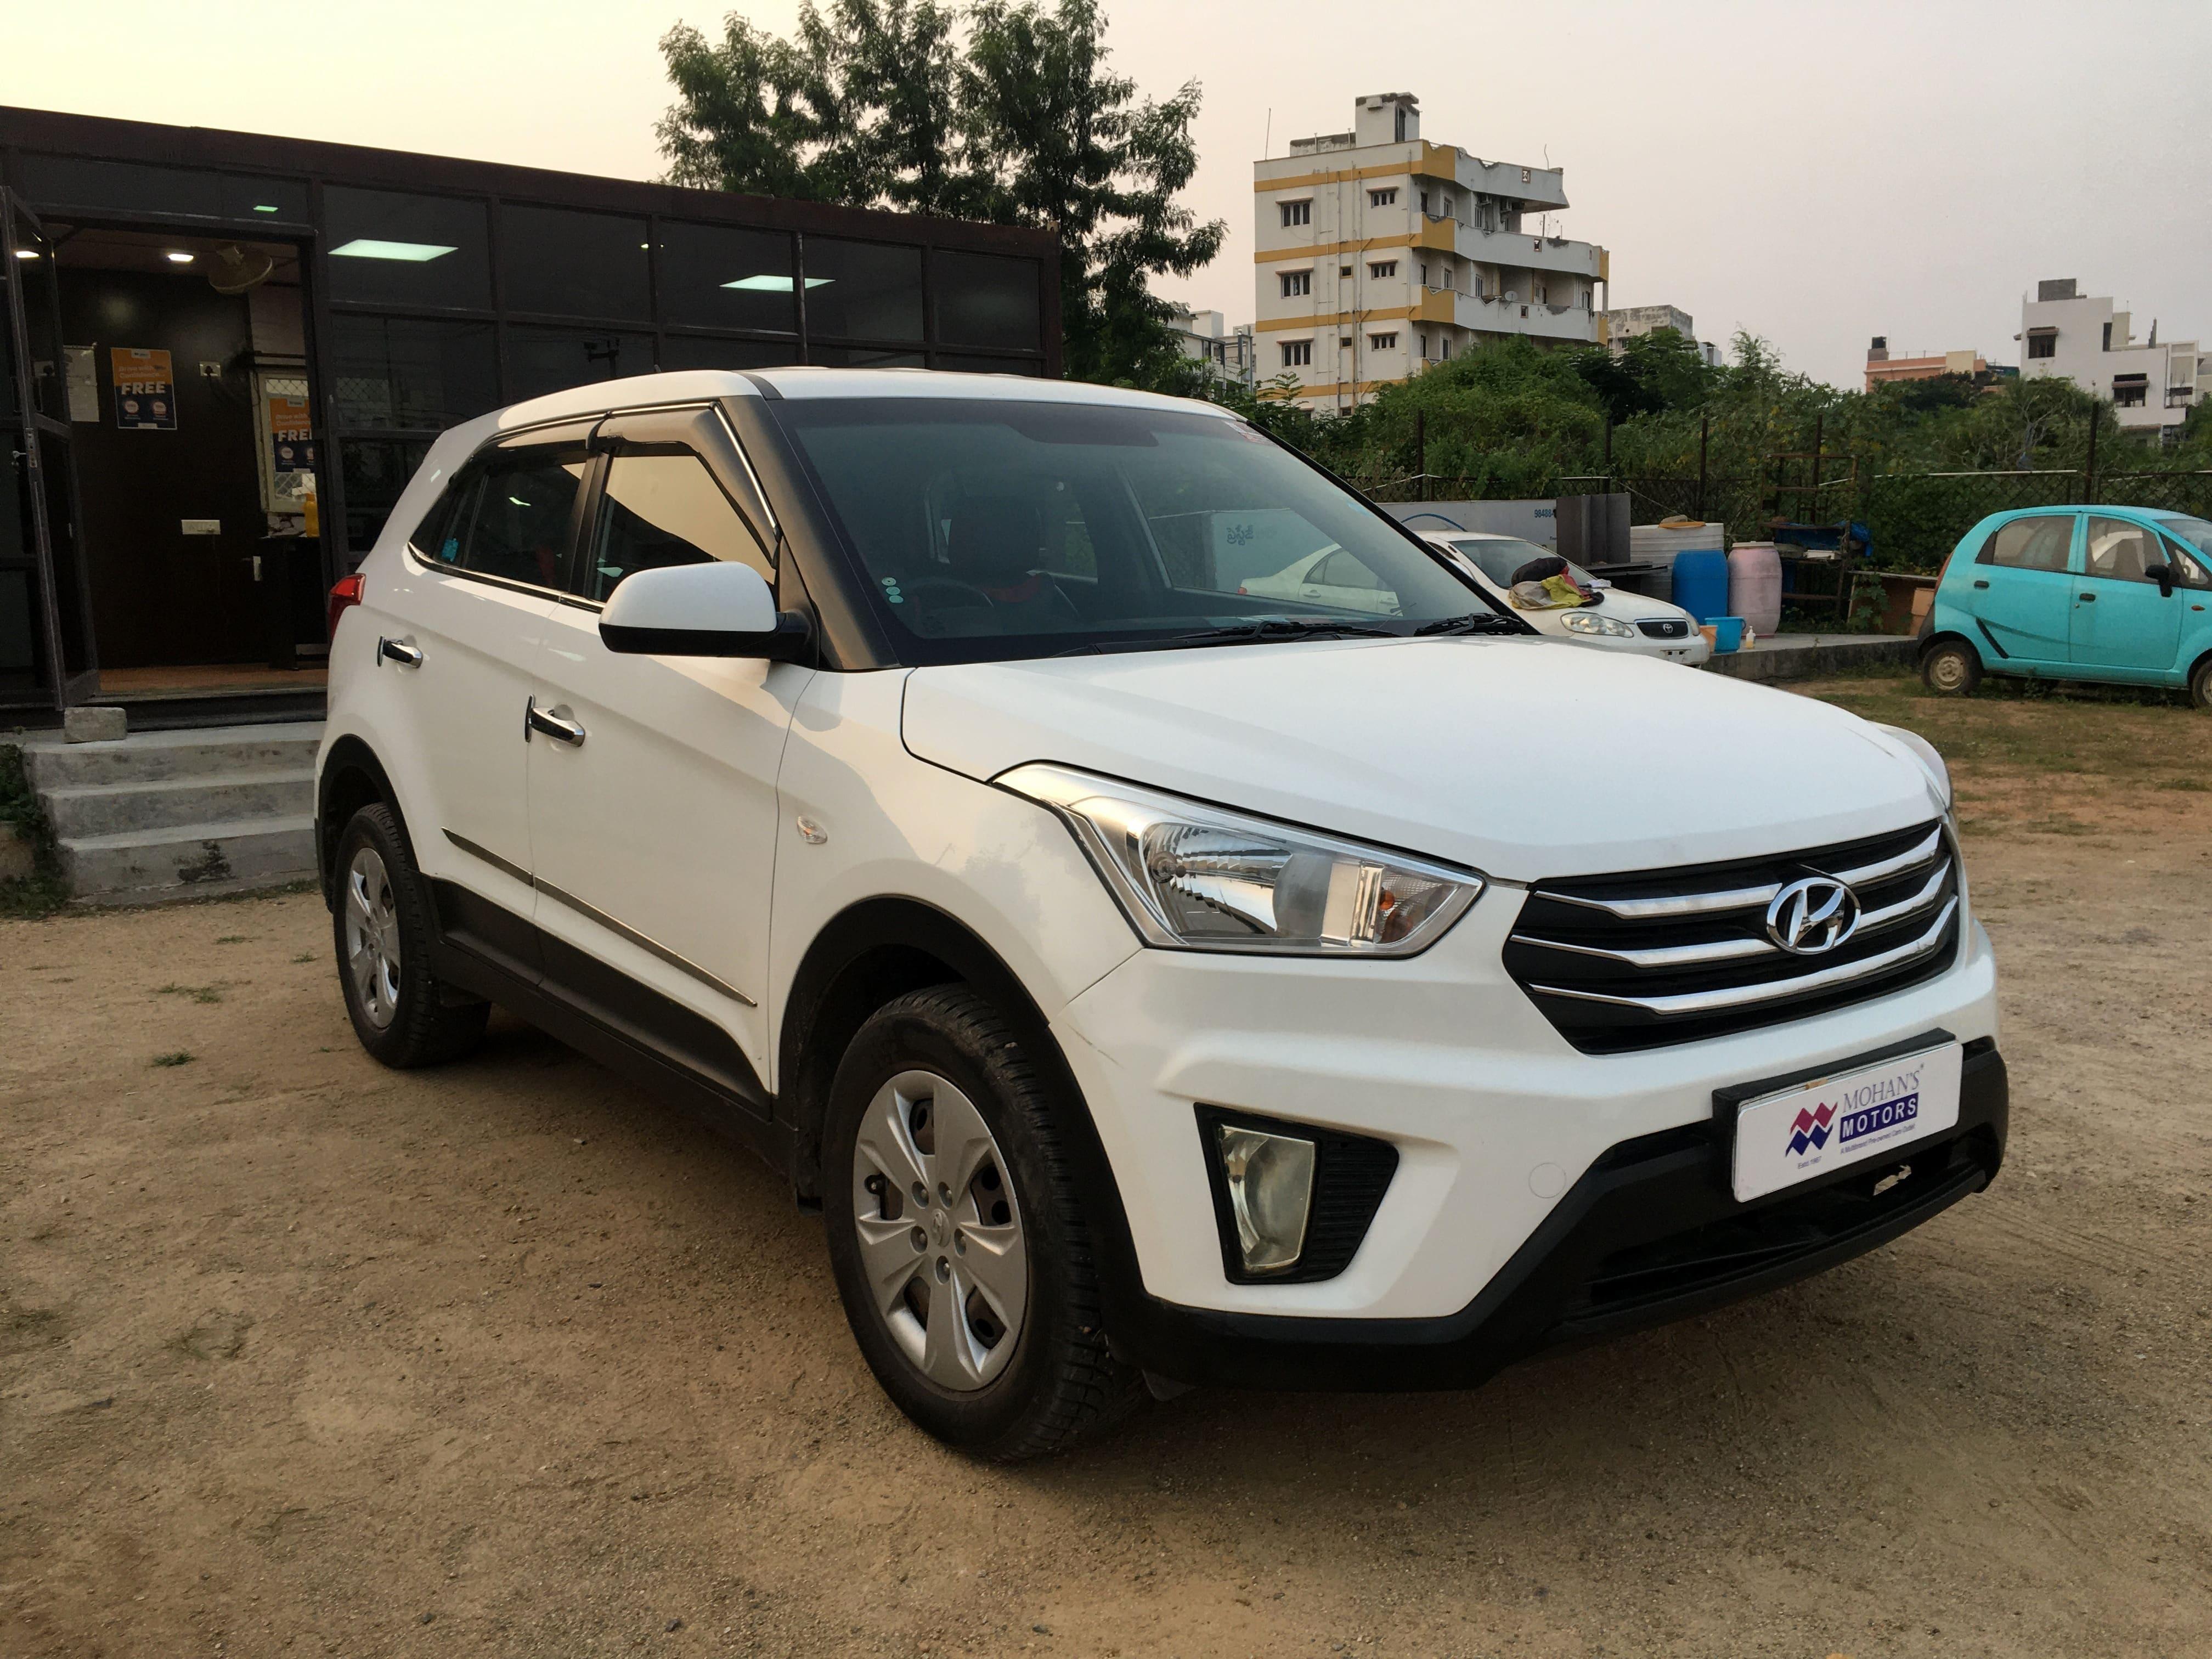 Hyundai Creta 2015-2020 1.4 CRDi S